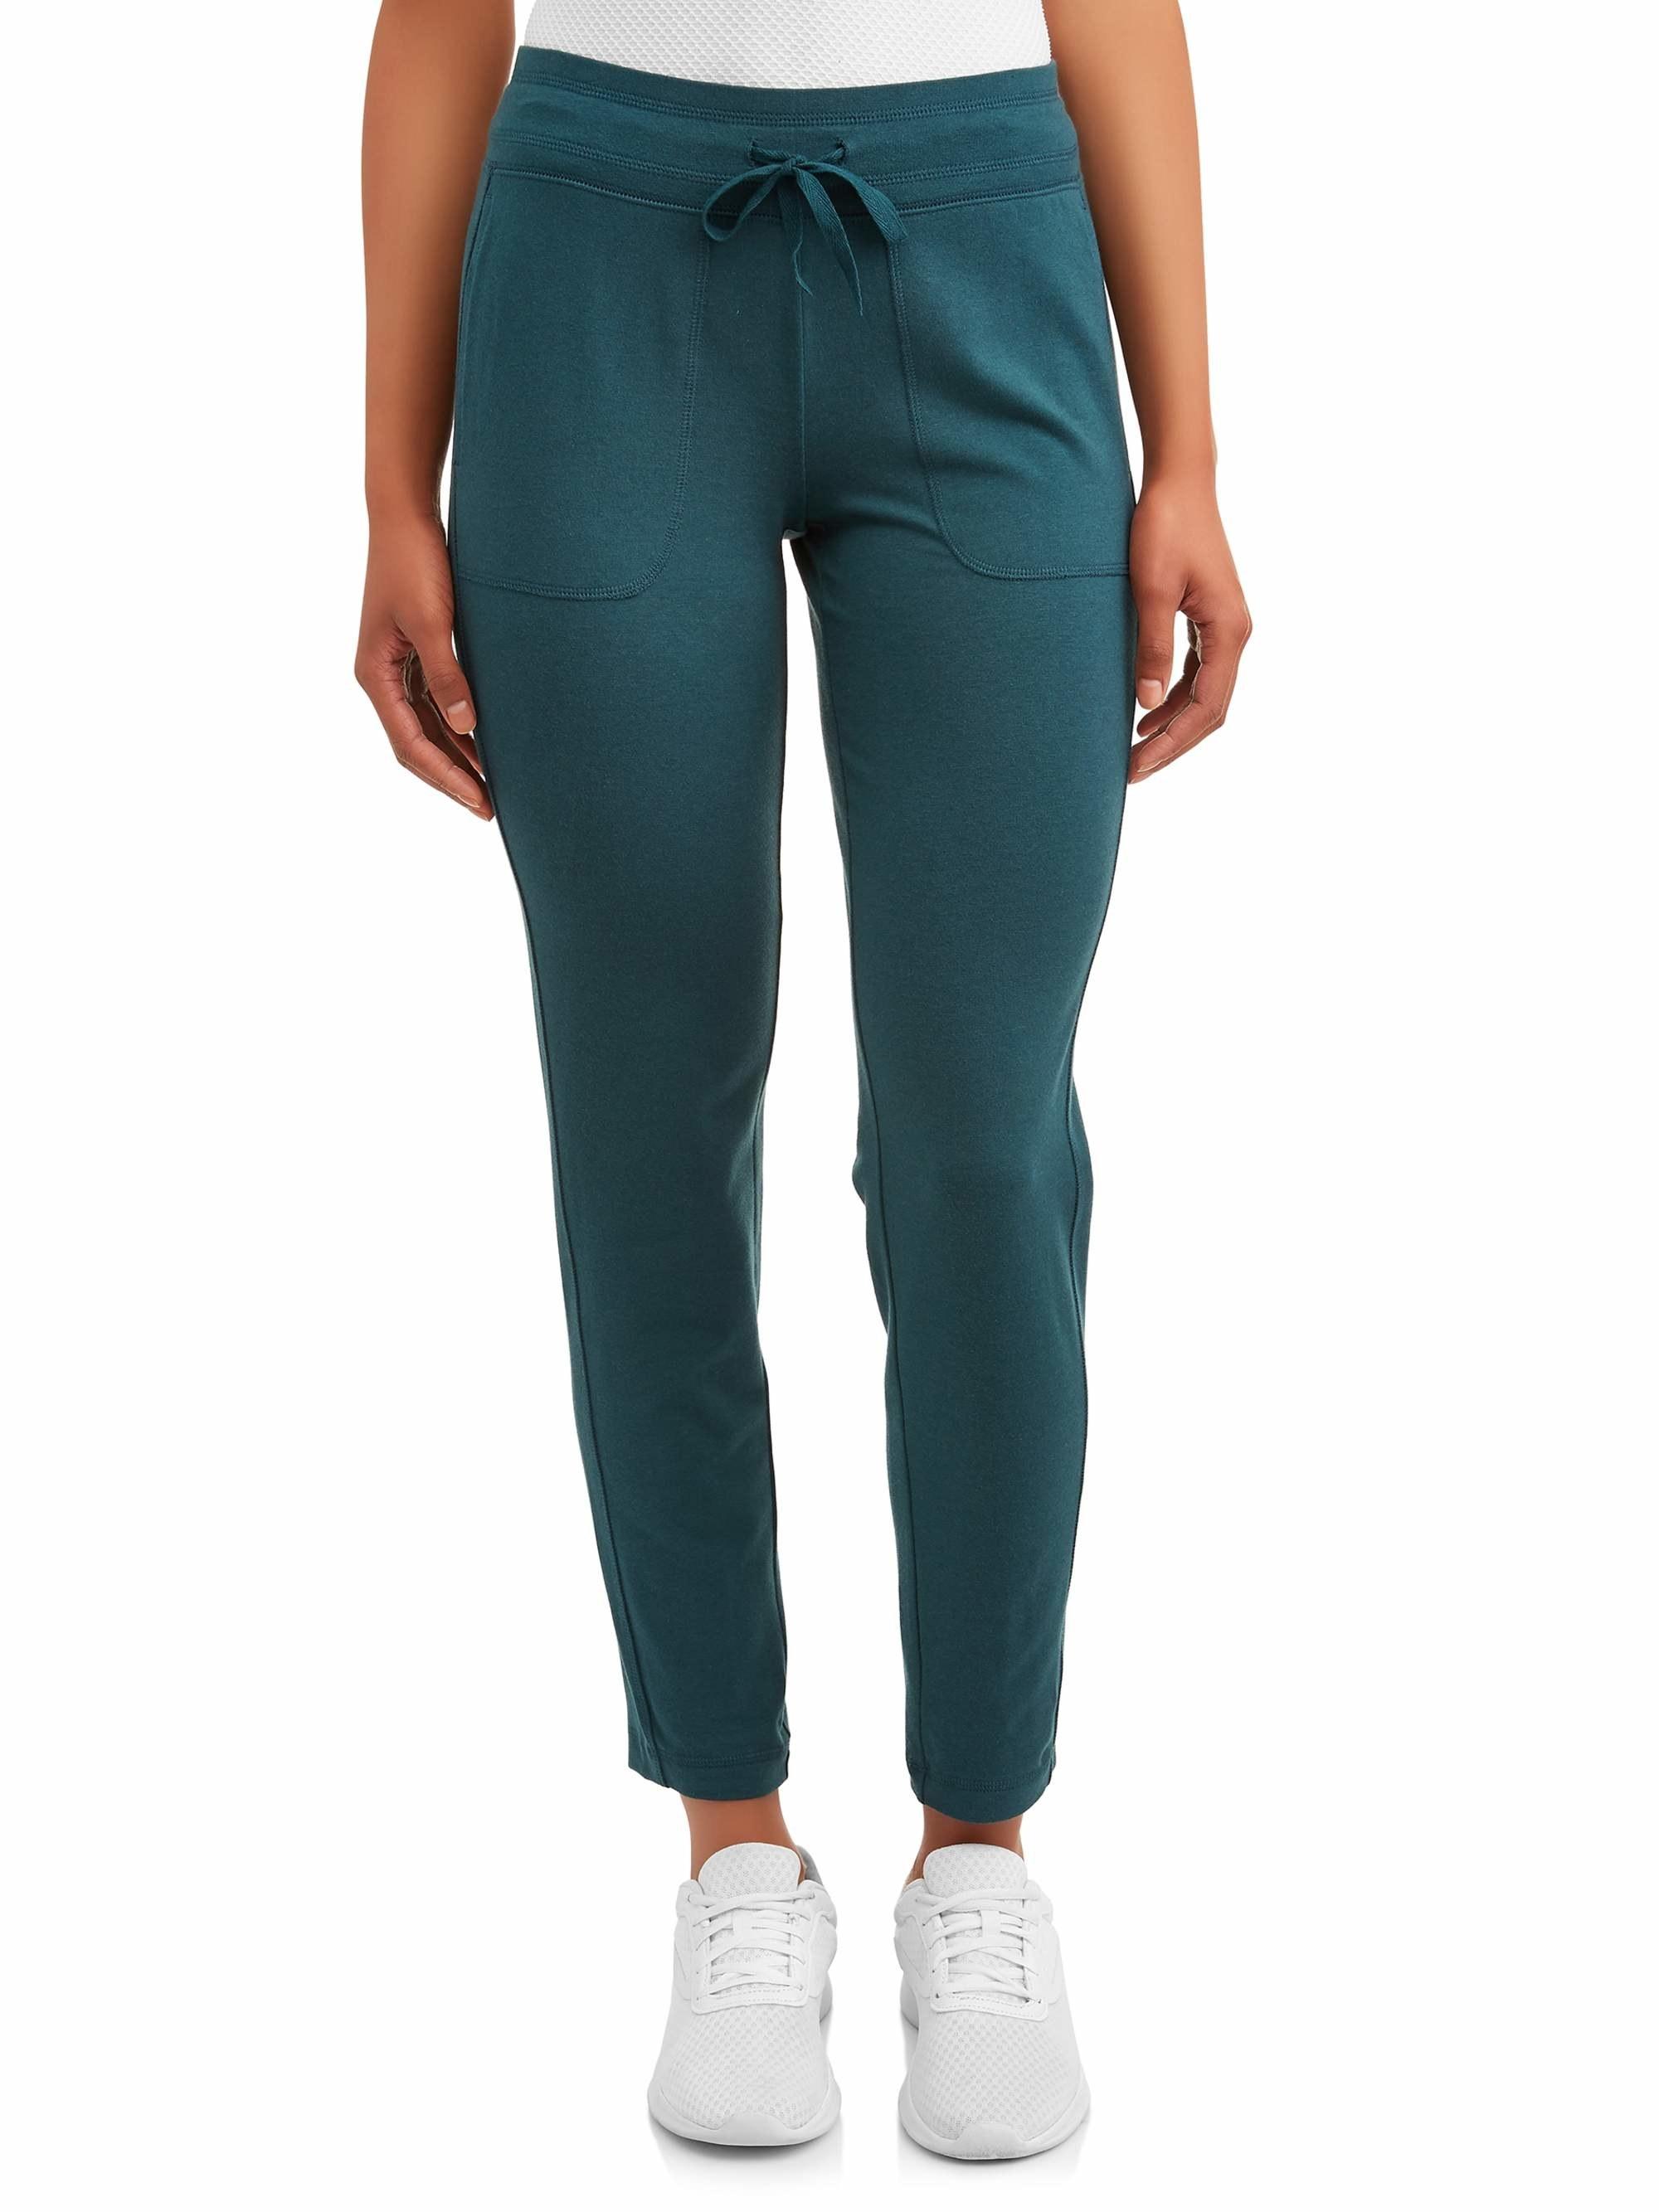 The green straight leg sweatpants